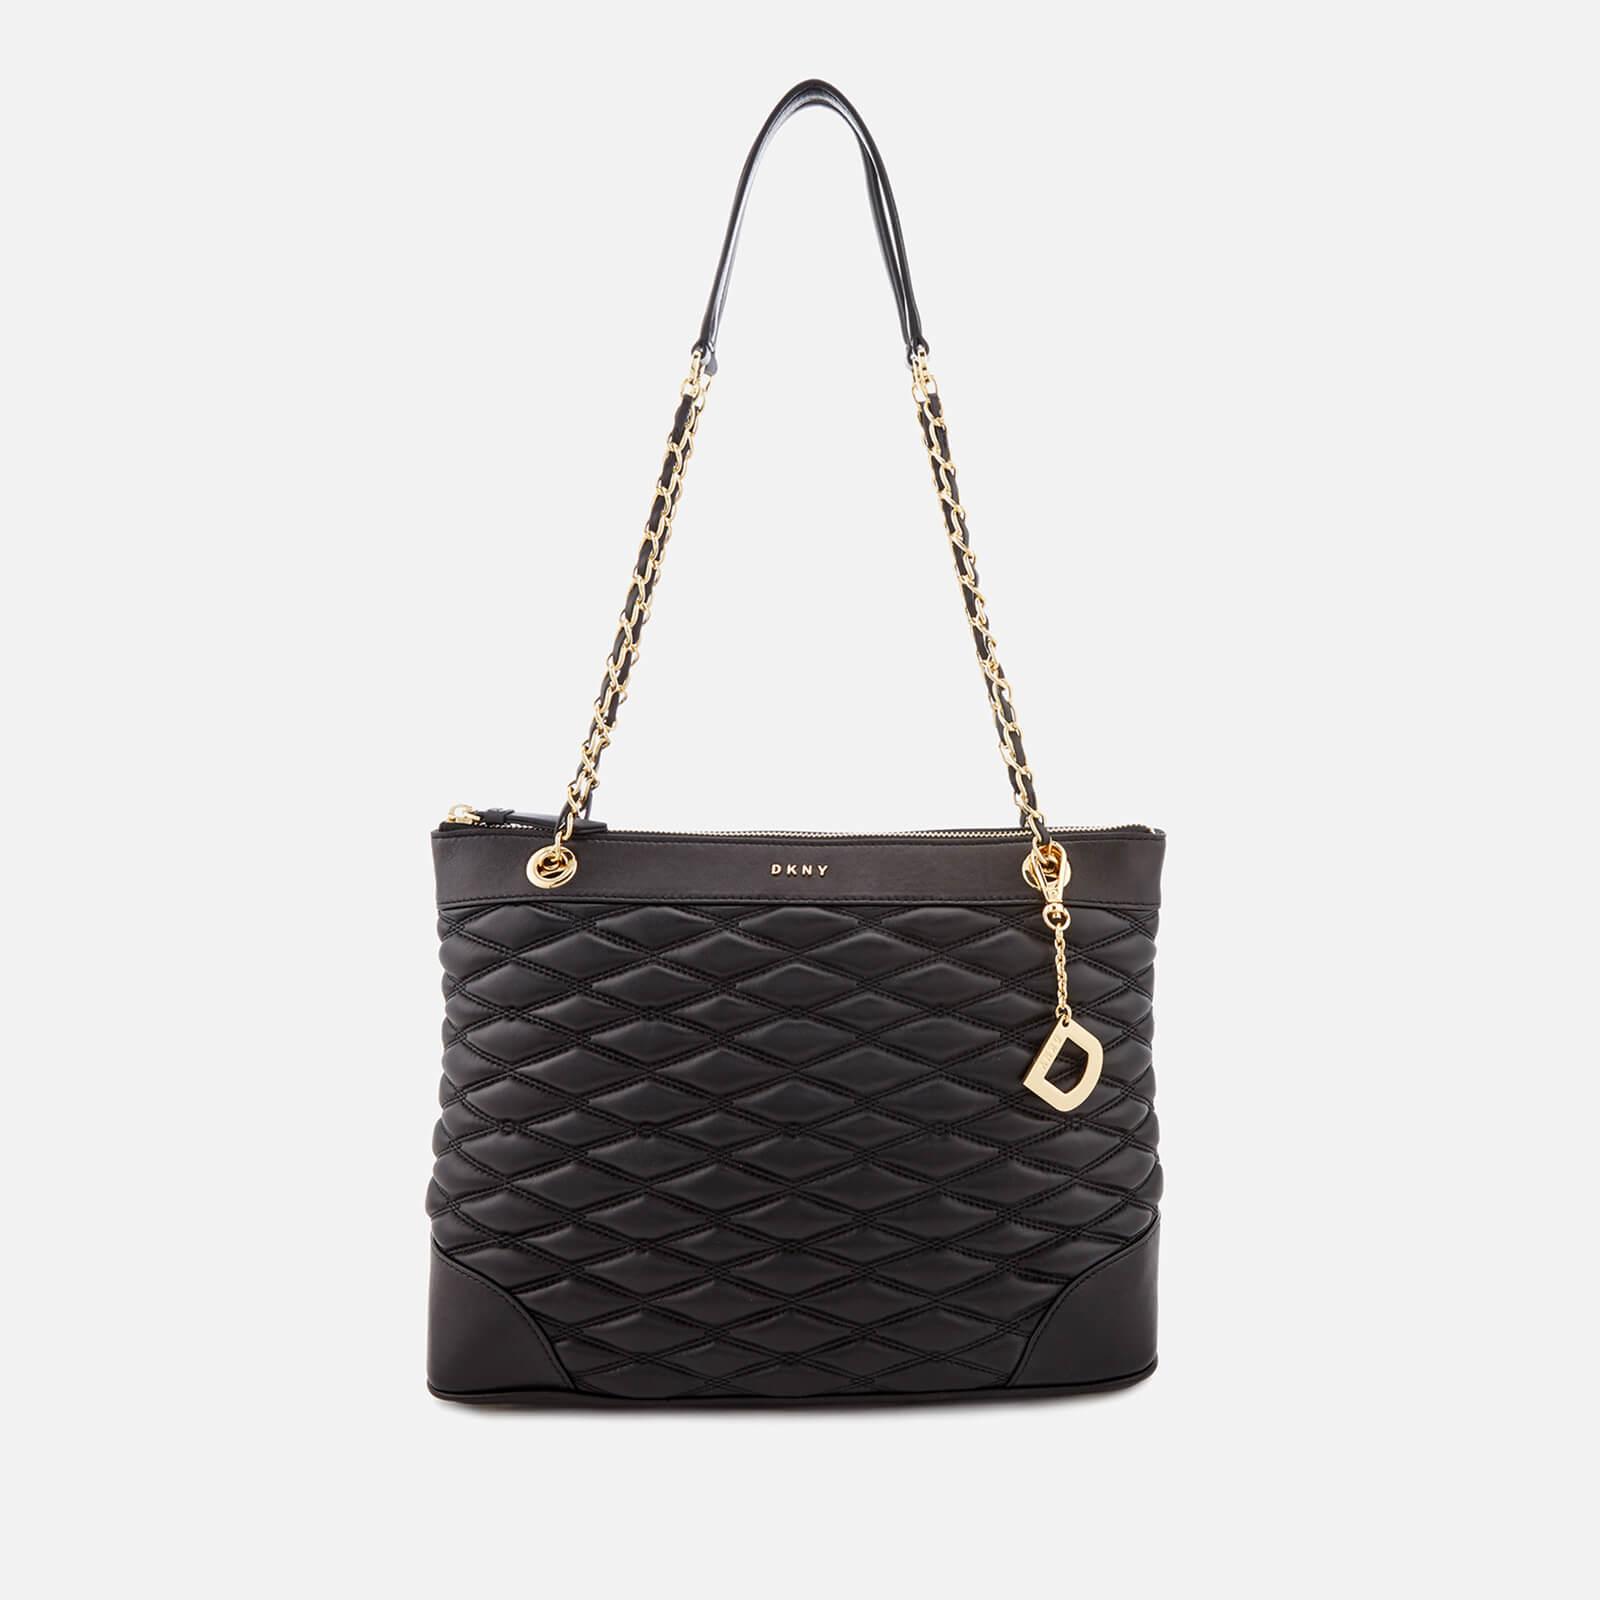 a5d742992 DKNY Women's Lara Medium Tote Bag - Black - Free UK Delivery over £50